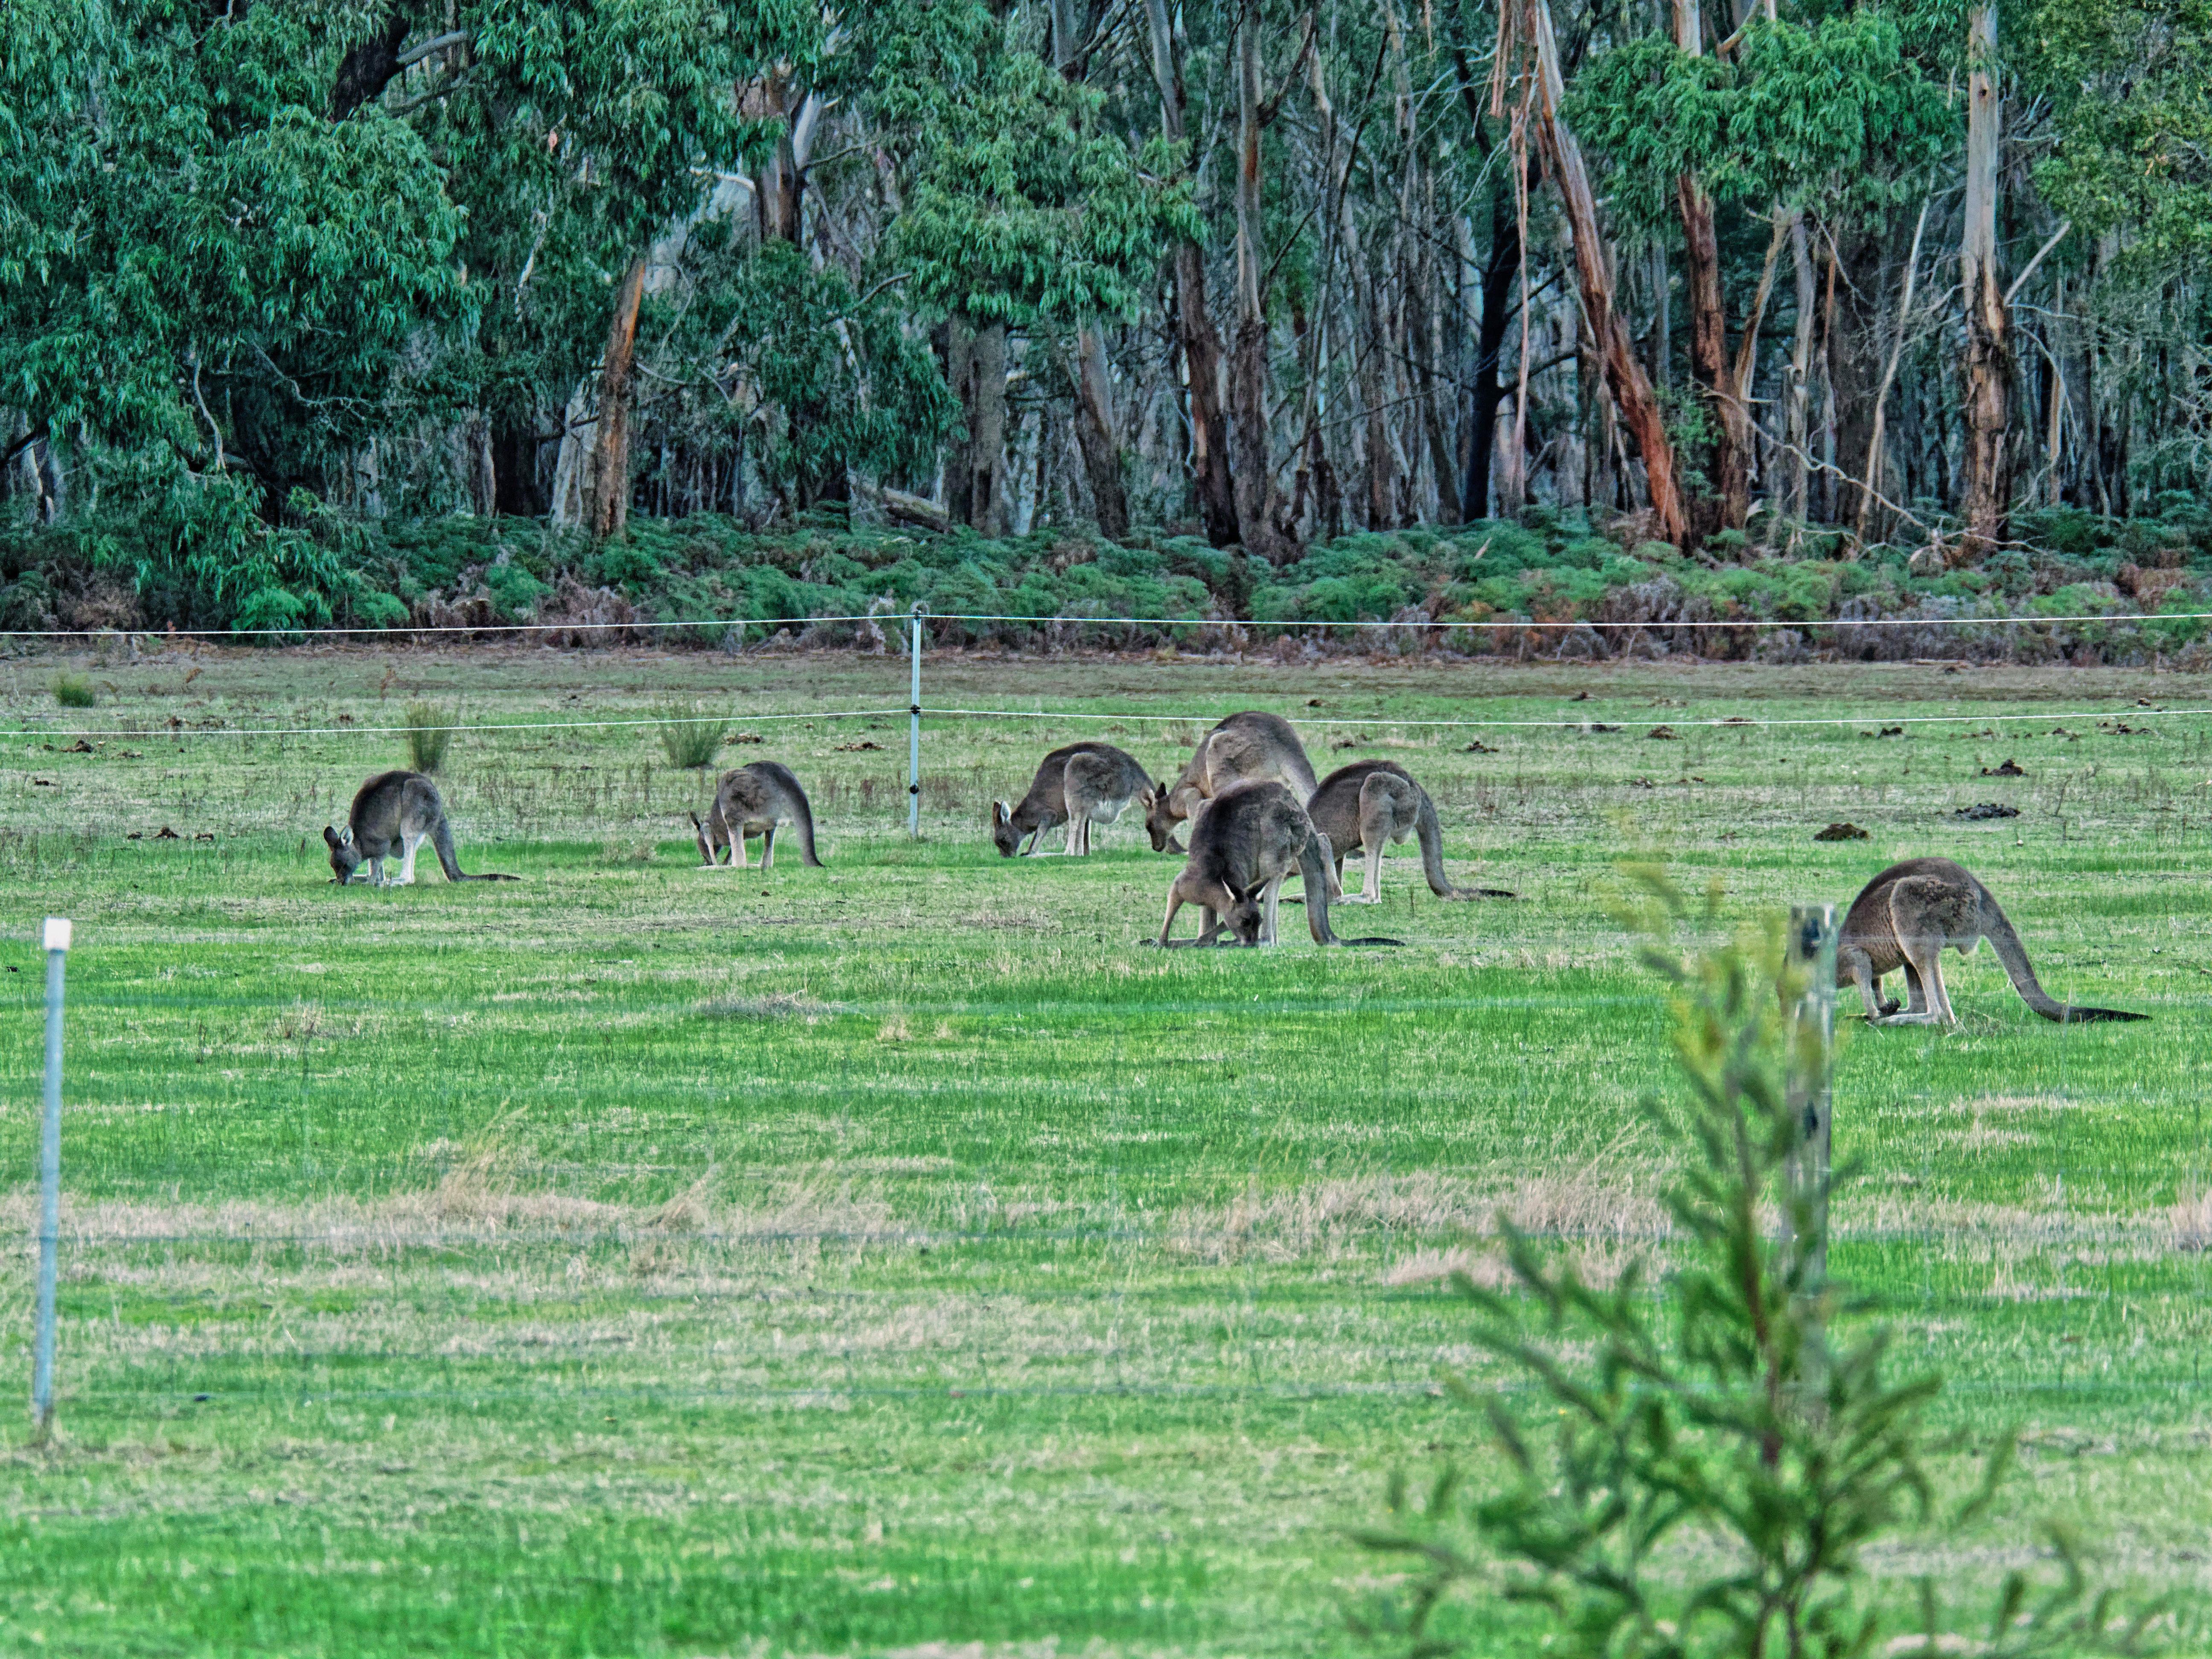 This should be Kangaroos-1.jpeg.  Is it missing?